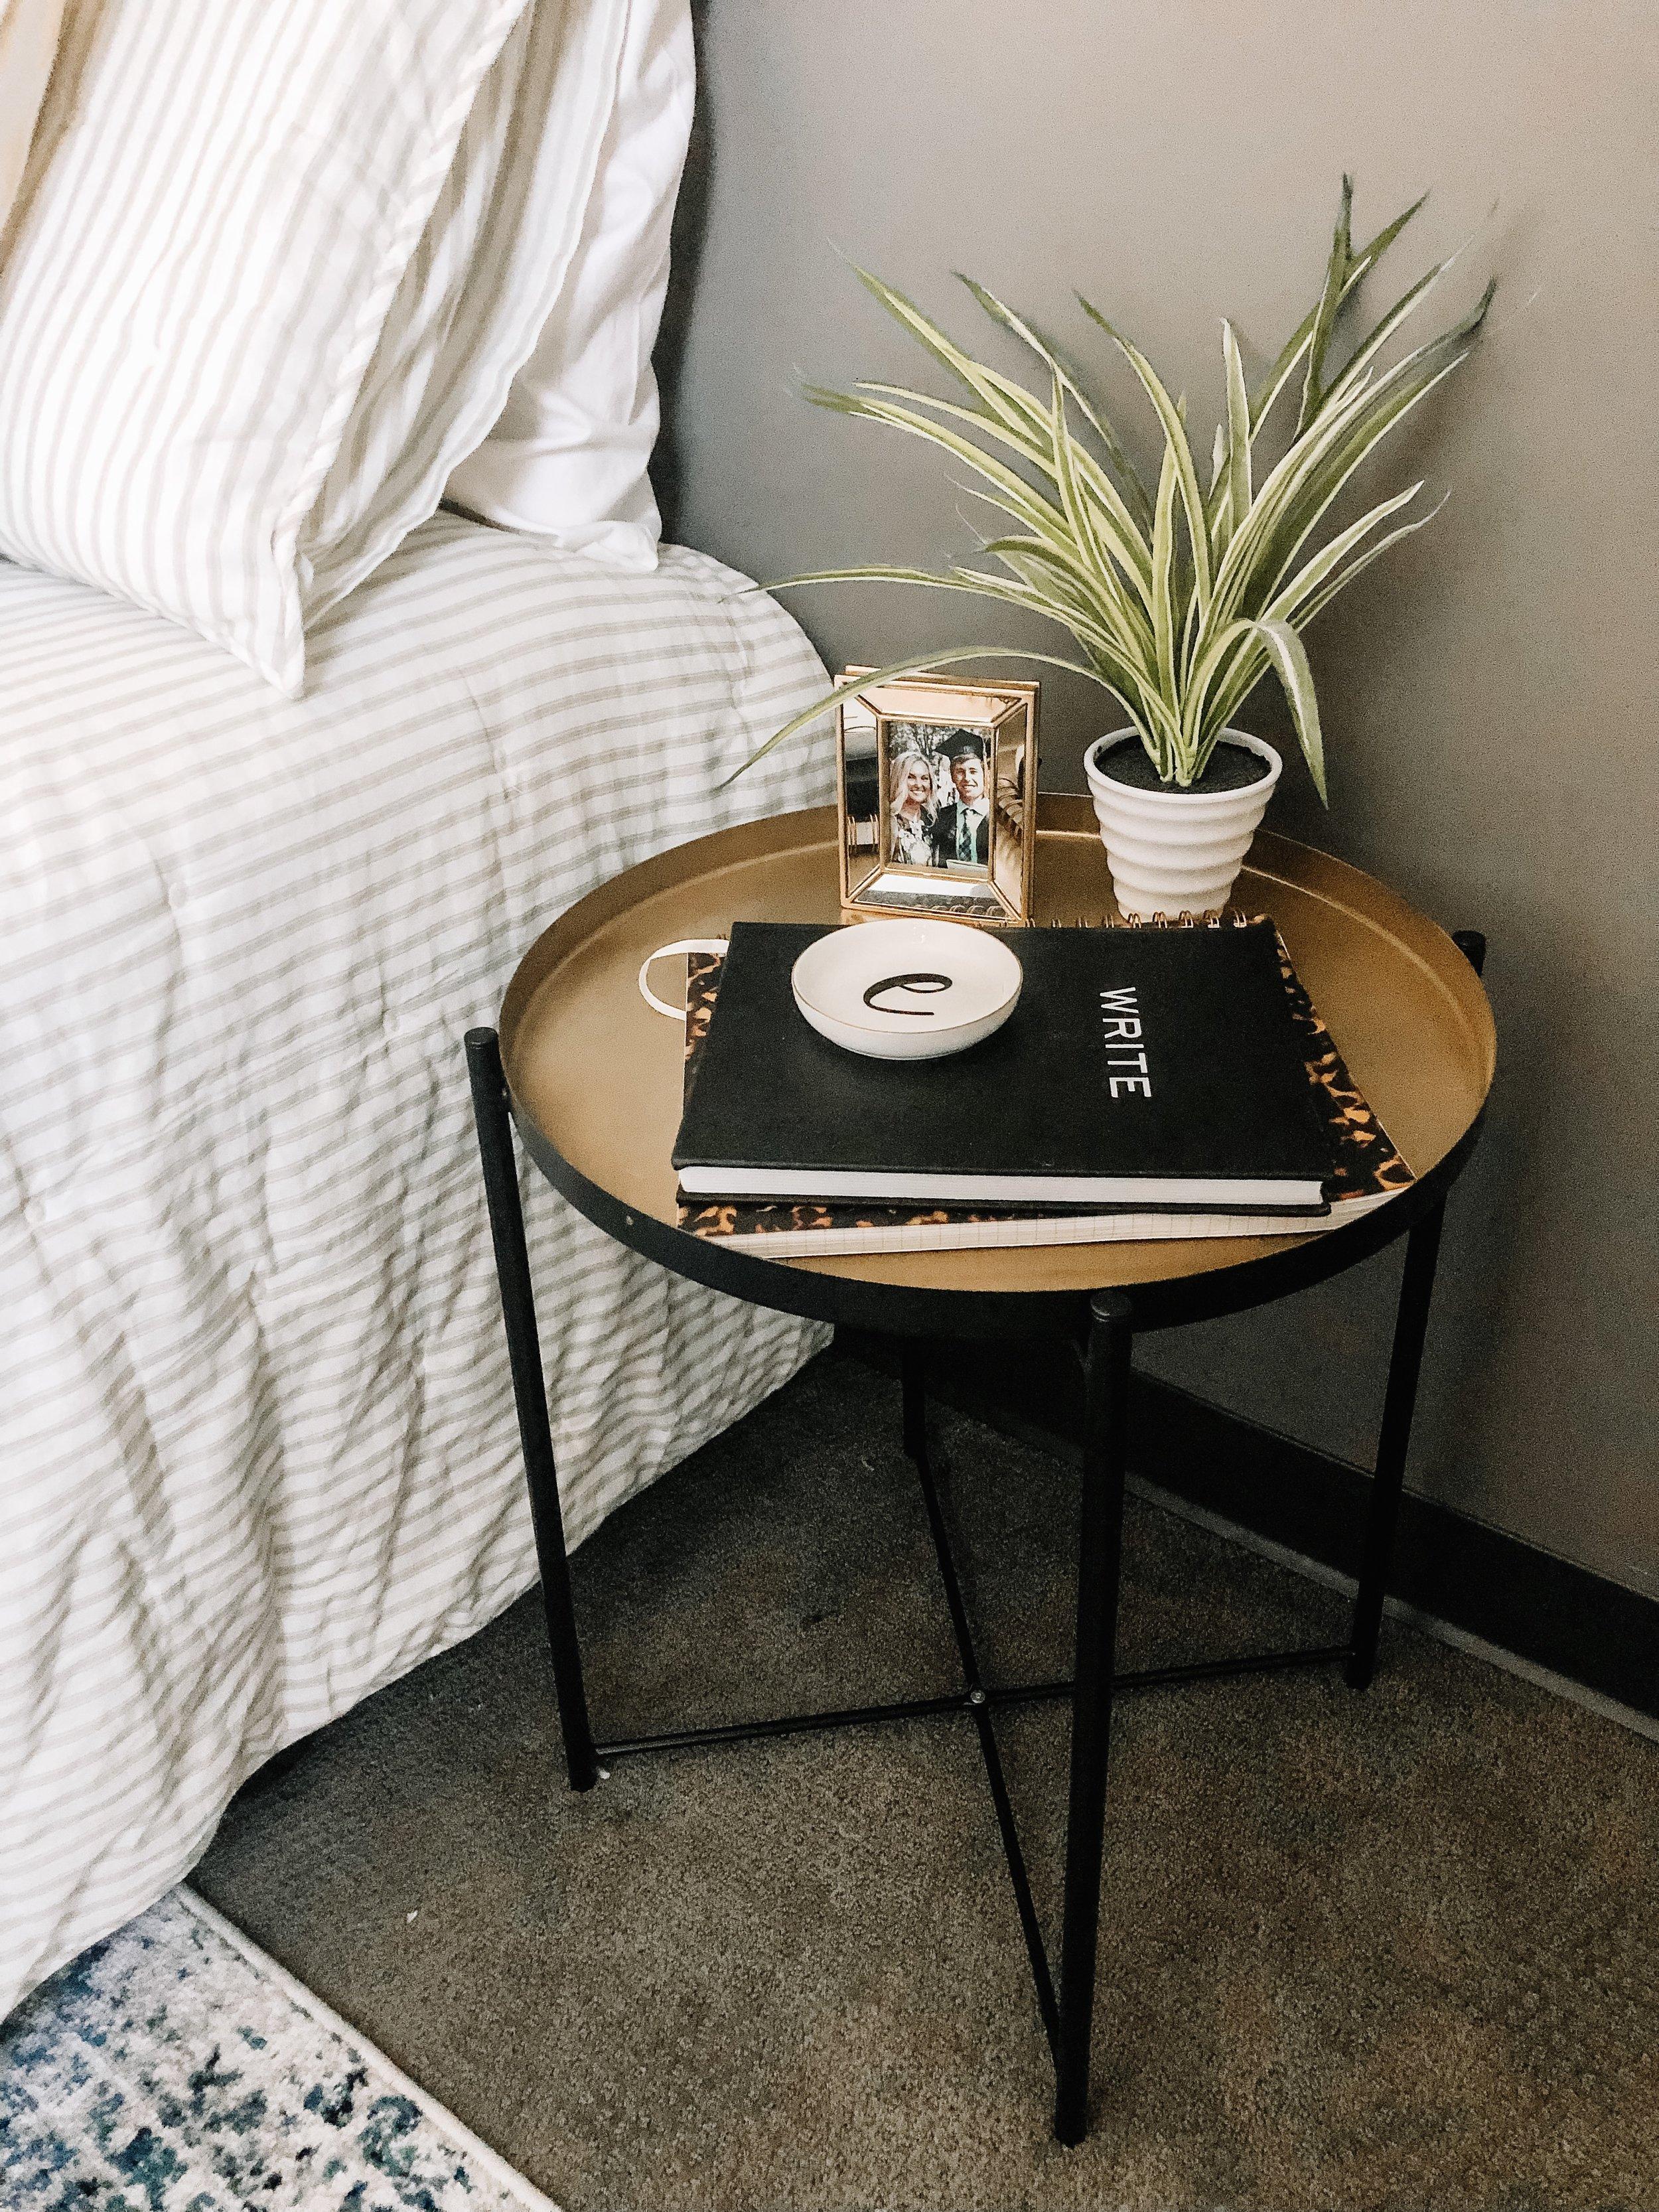 Ikea Gladom Tray Table Hack